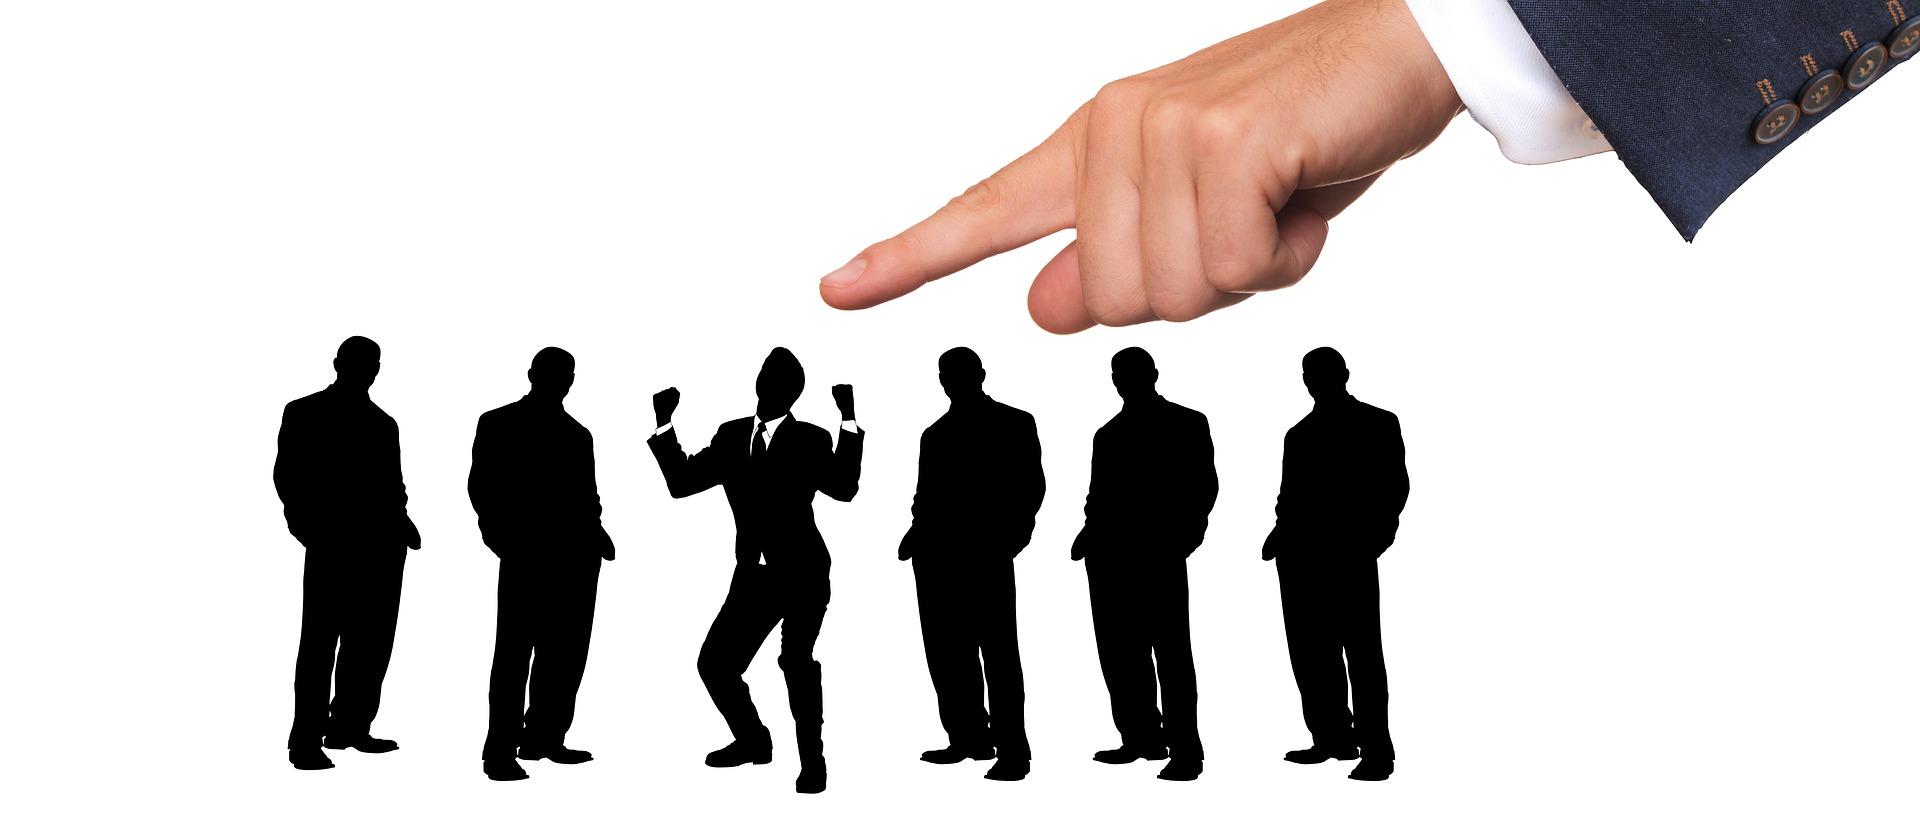 HR, Human resource, SAP HR, SAP HCM, SAP Human Capital Management